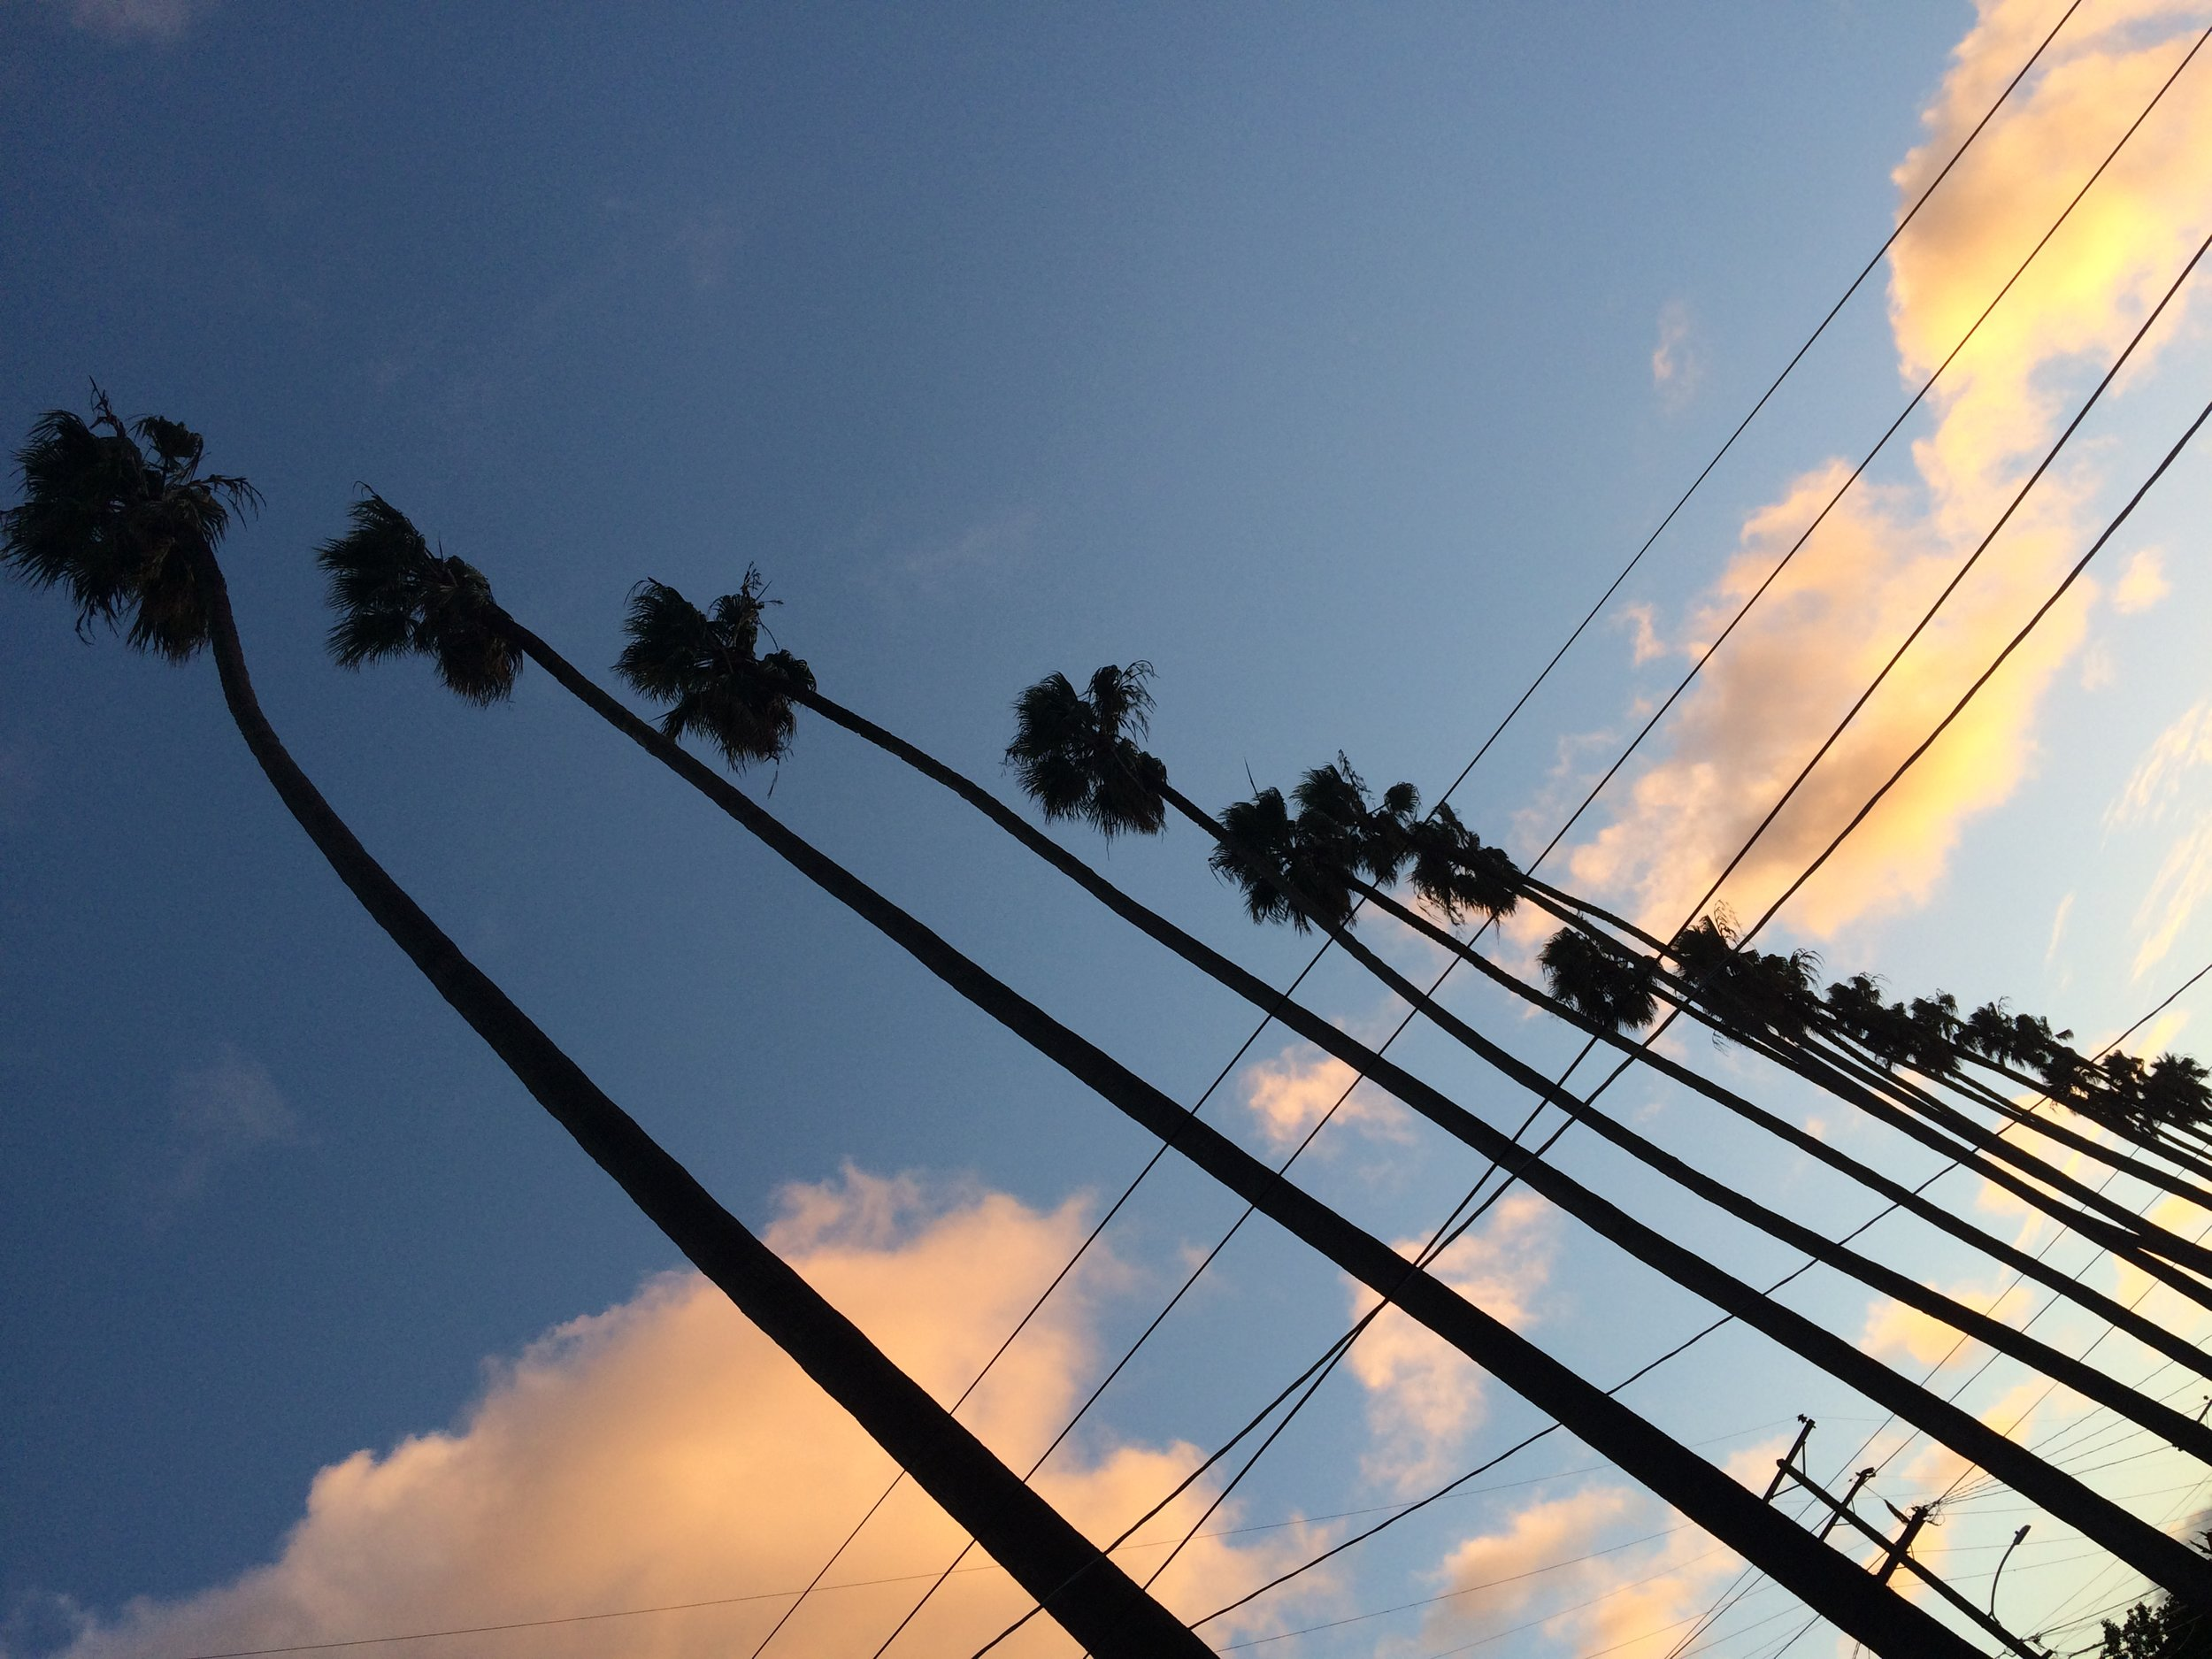 palms sideways blow up (1).jpg